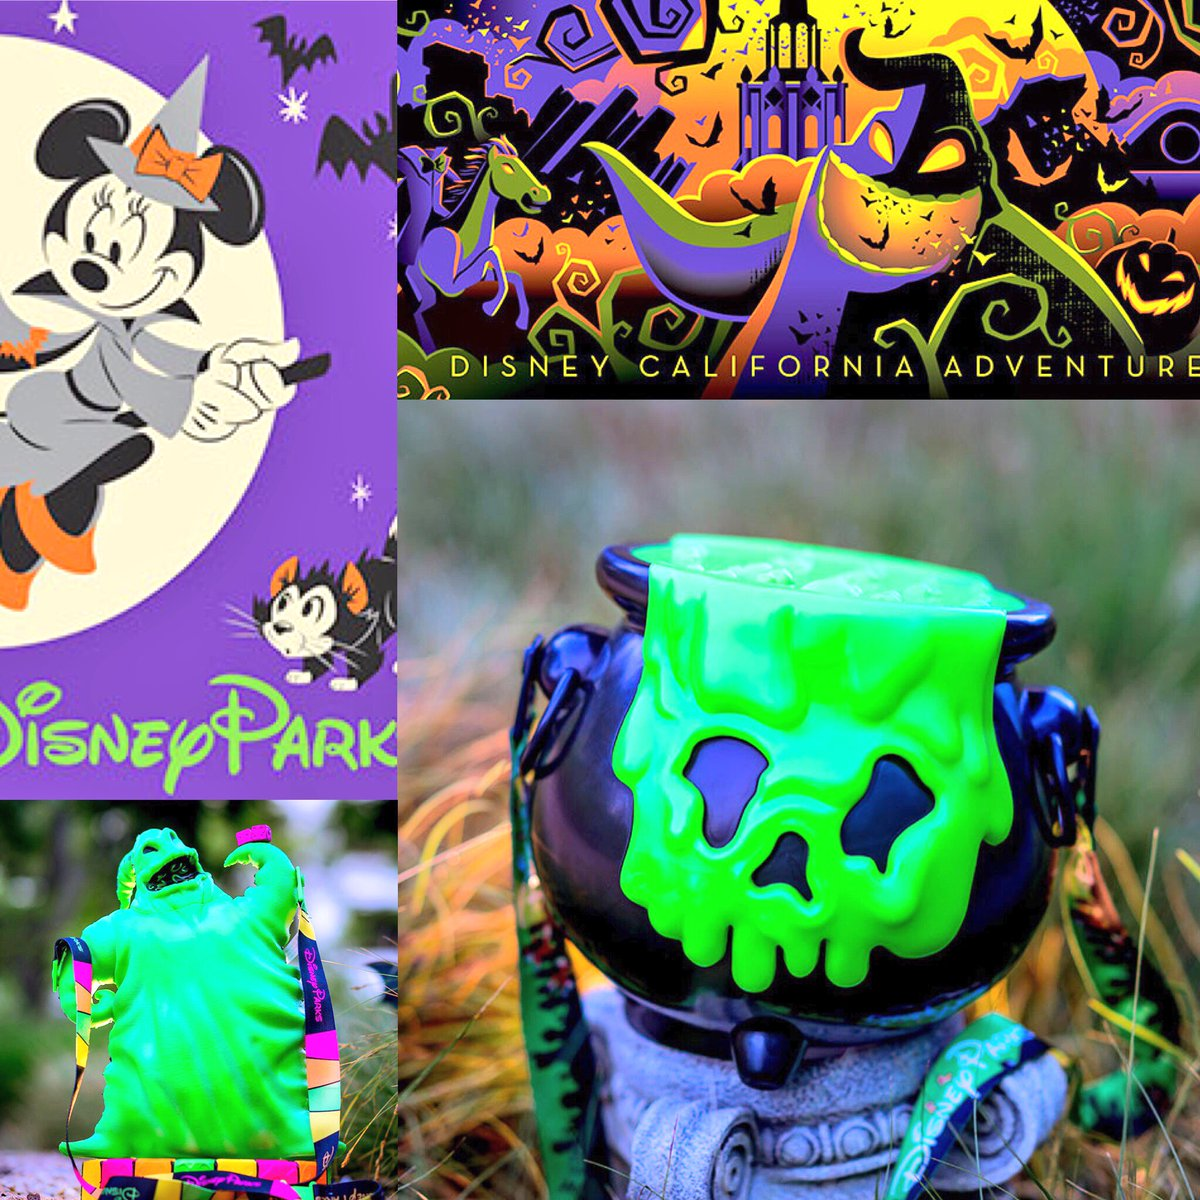 Disneyland Halloween Popcorn Bucket 2018.Wdw News Today On Twitter New Halloween Popcorn Buckets